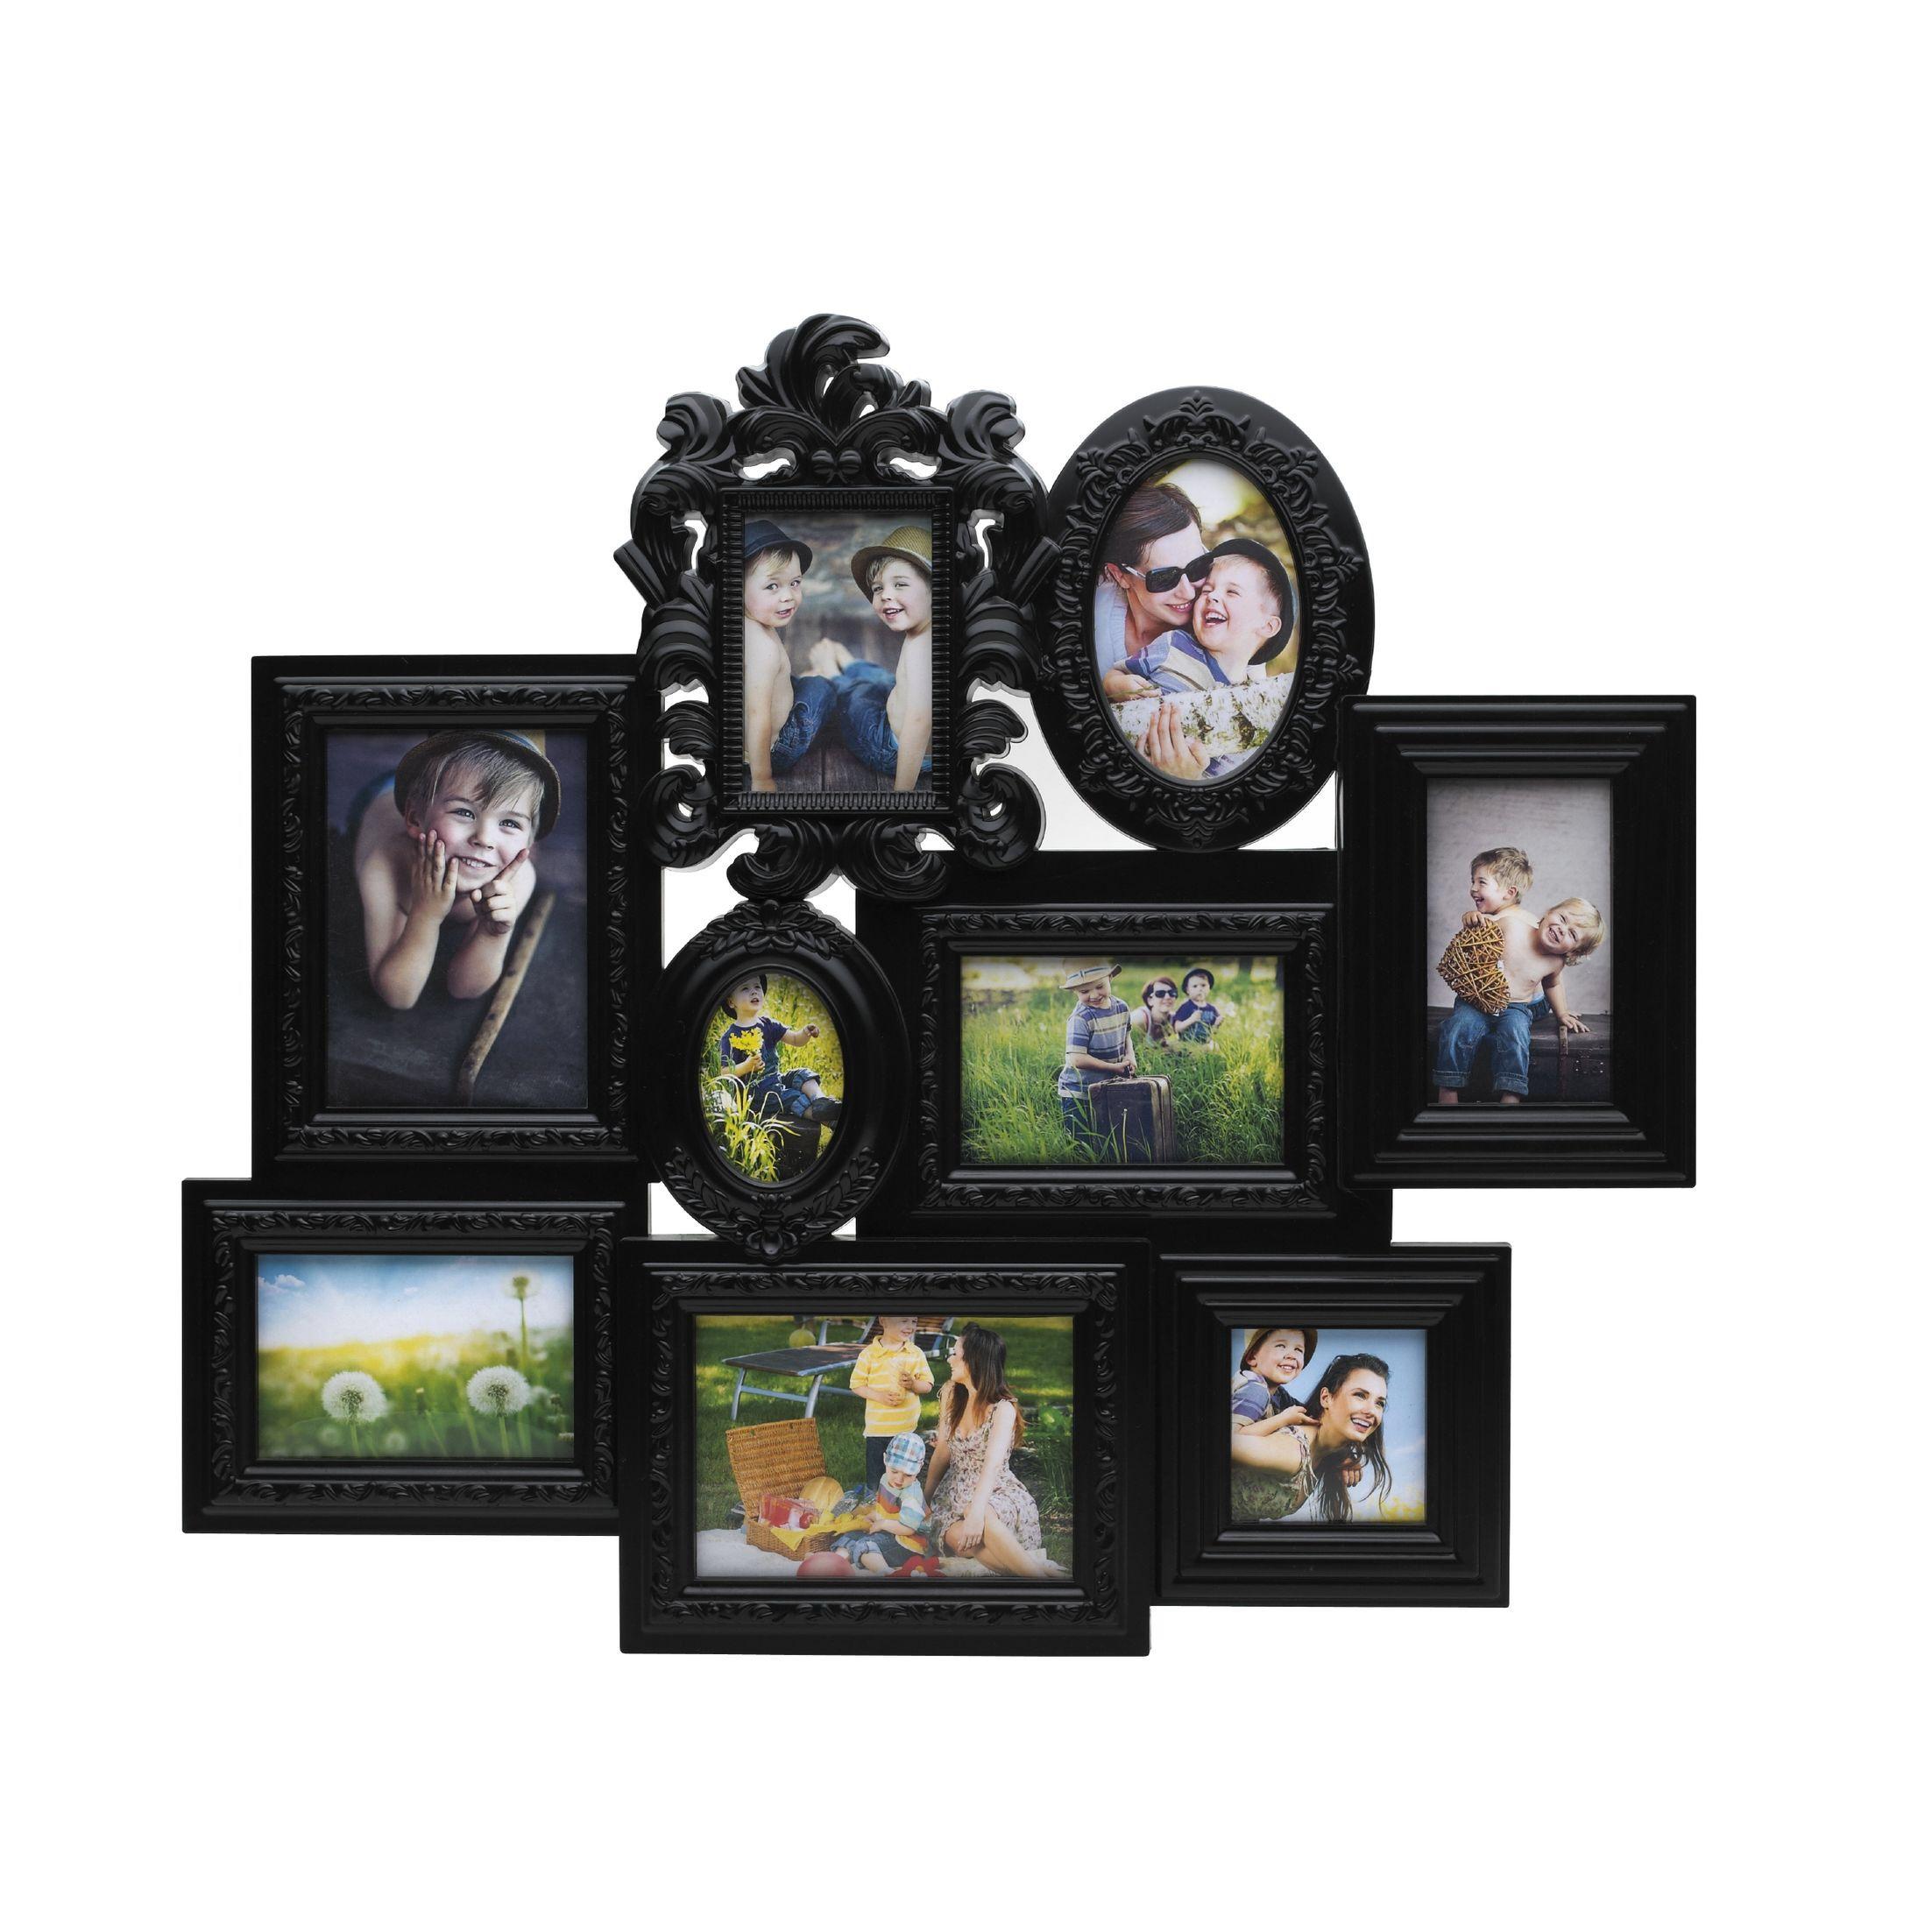 9-Opening Ornate Collage Frame | Capturing memories | Pinterest